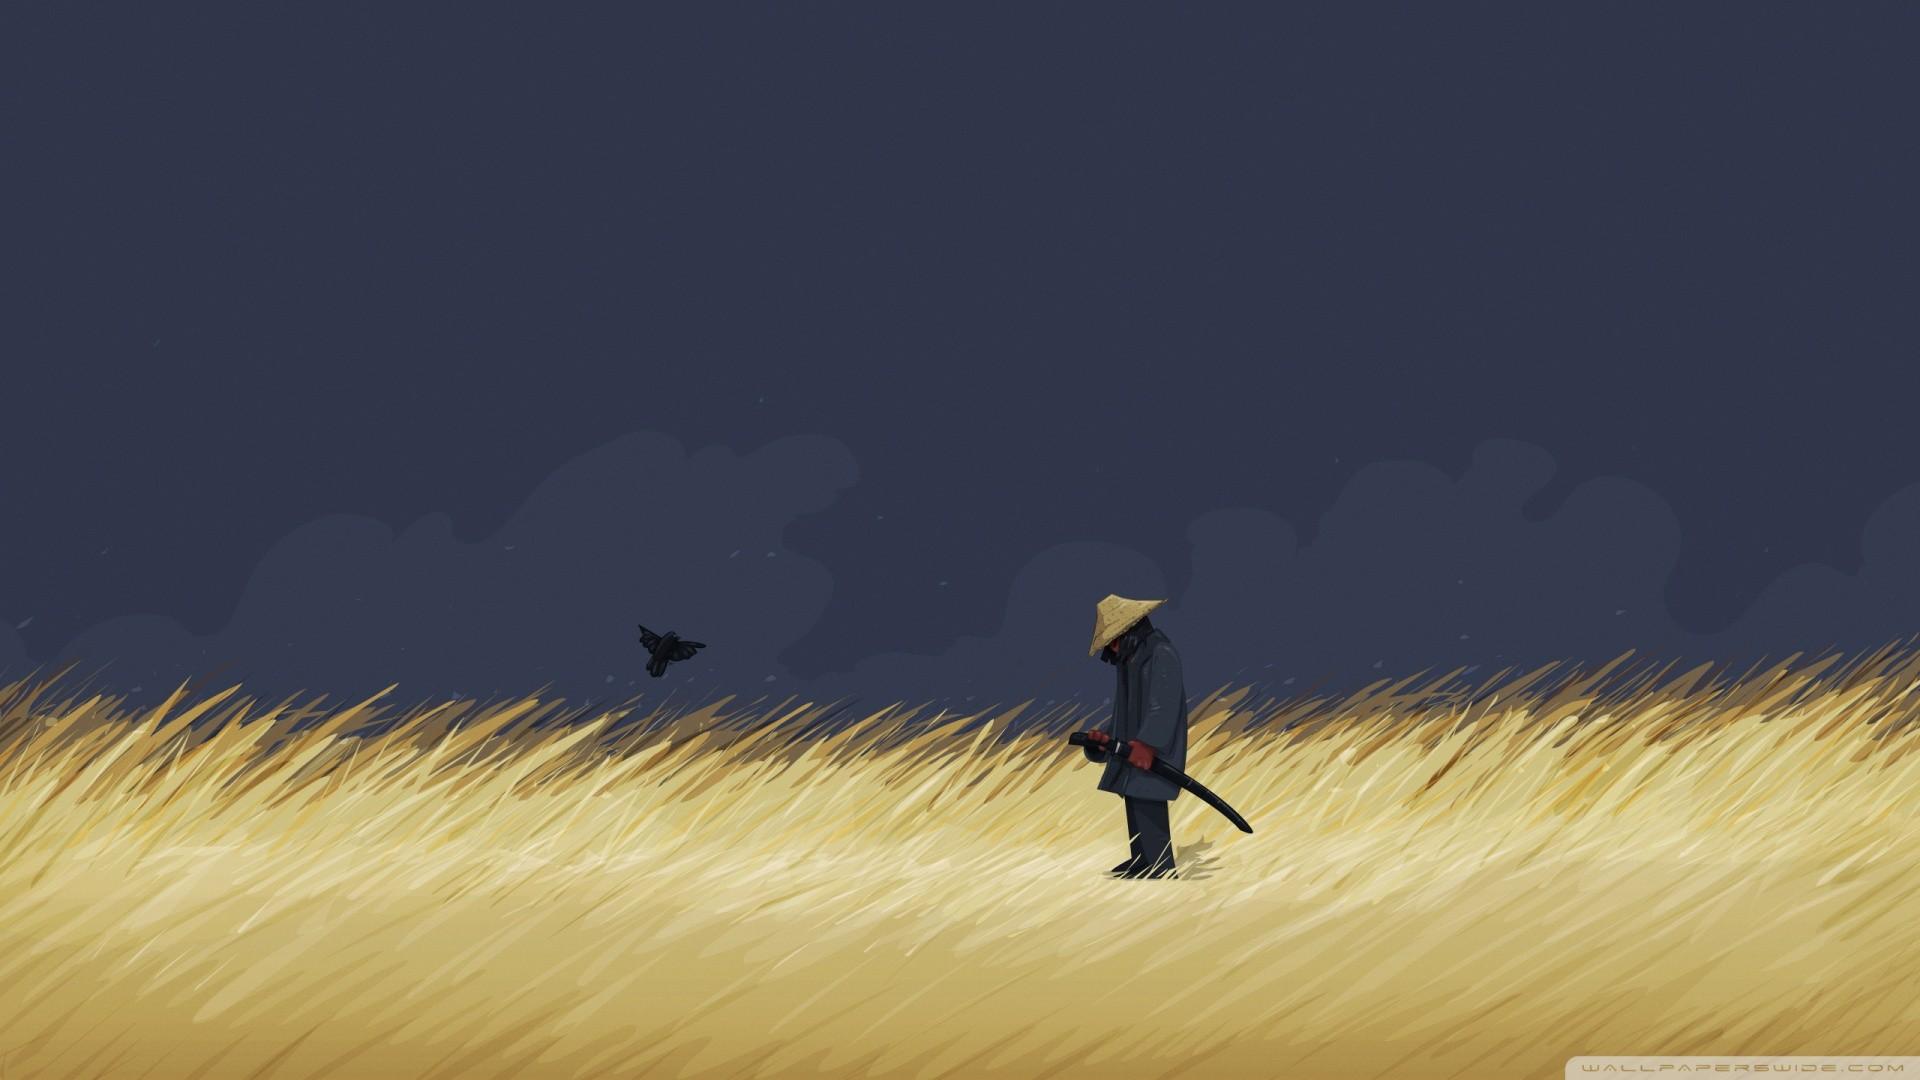 9. samurai-wallpaper9-600×338